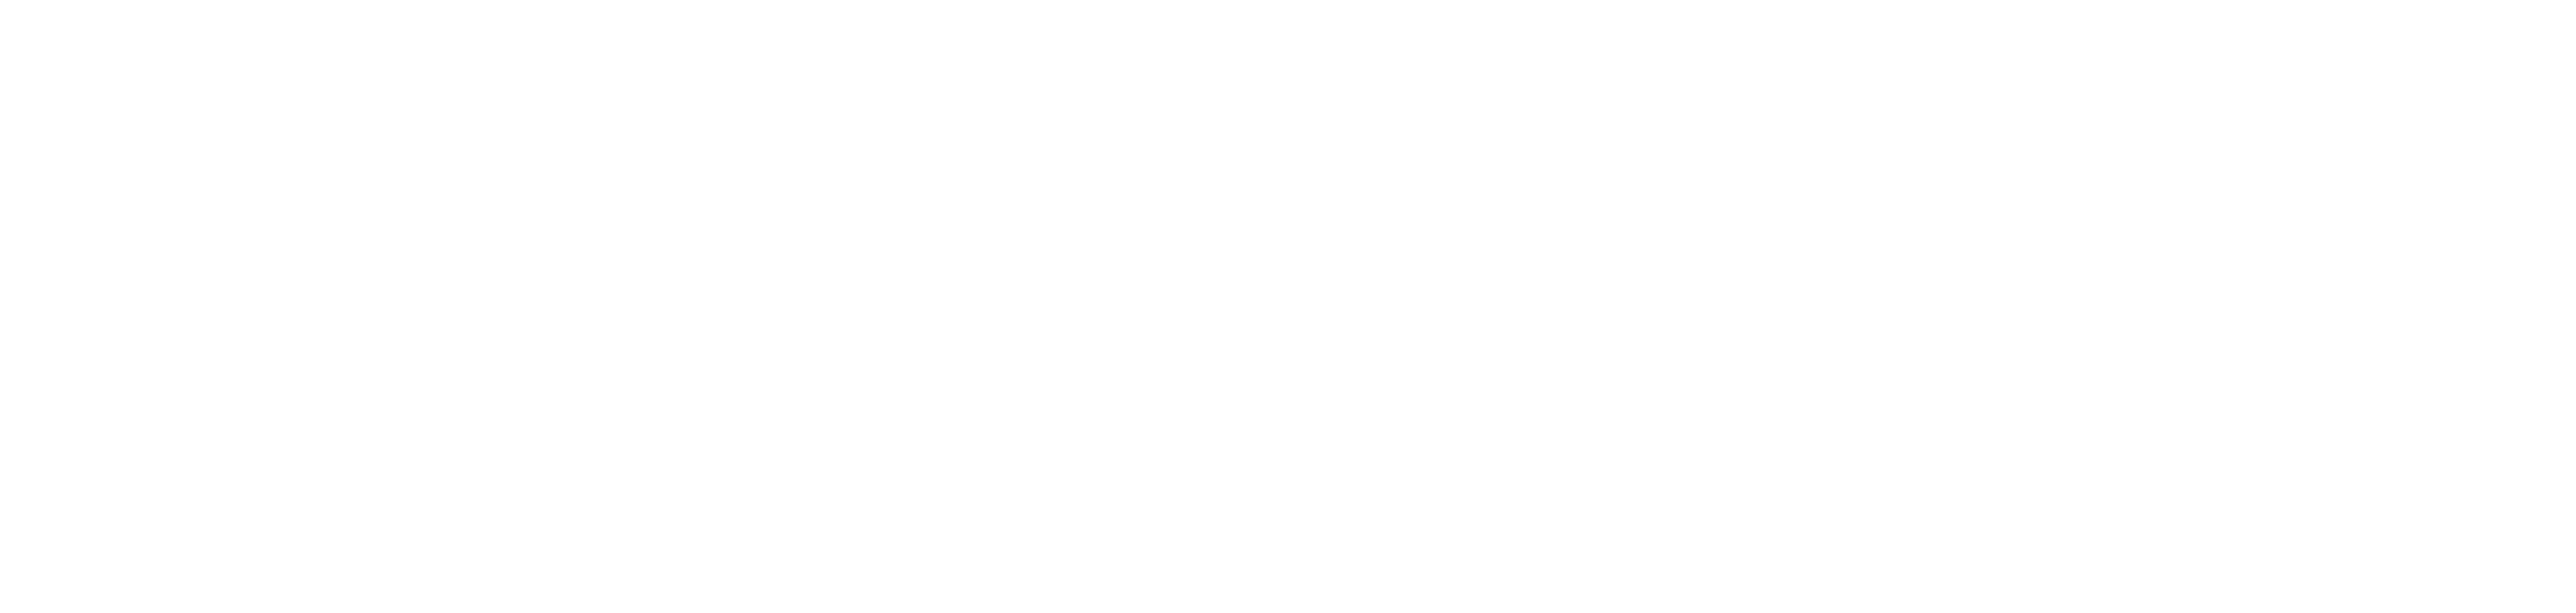 KAST 010 logo